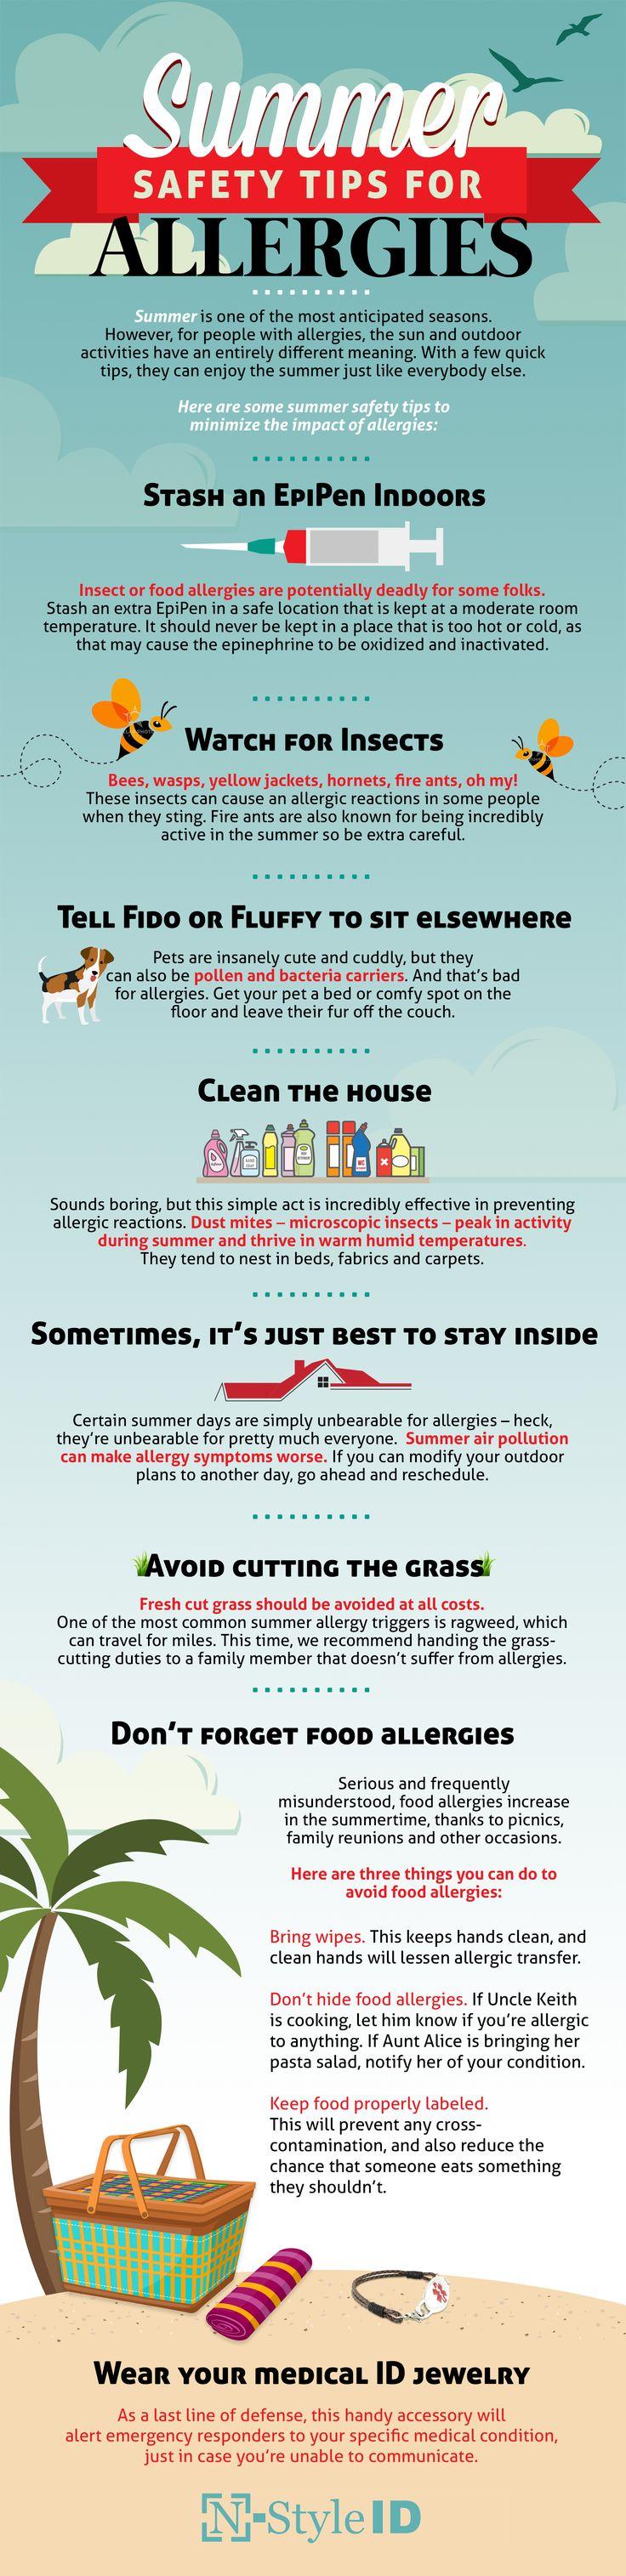 Best 25 Summer safety tips ideas on Pinterest